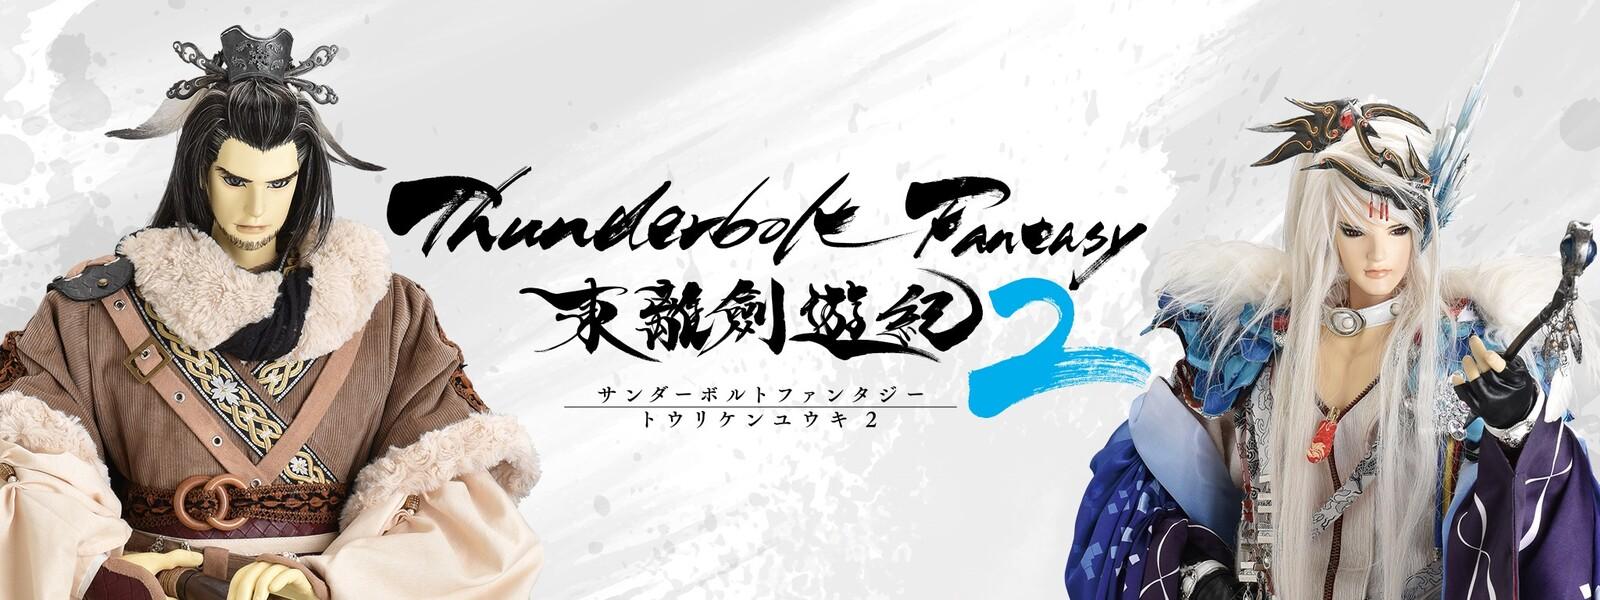 Thunderbolt Fantasy 東離劍遊紀2(サンダーボルトファンタジー)